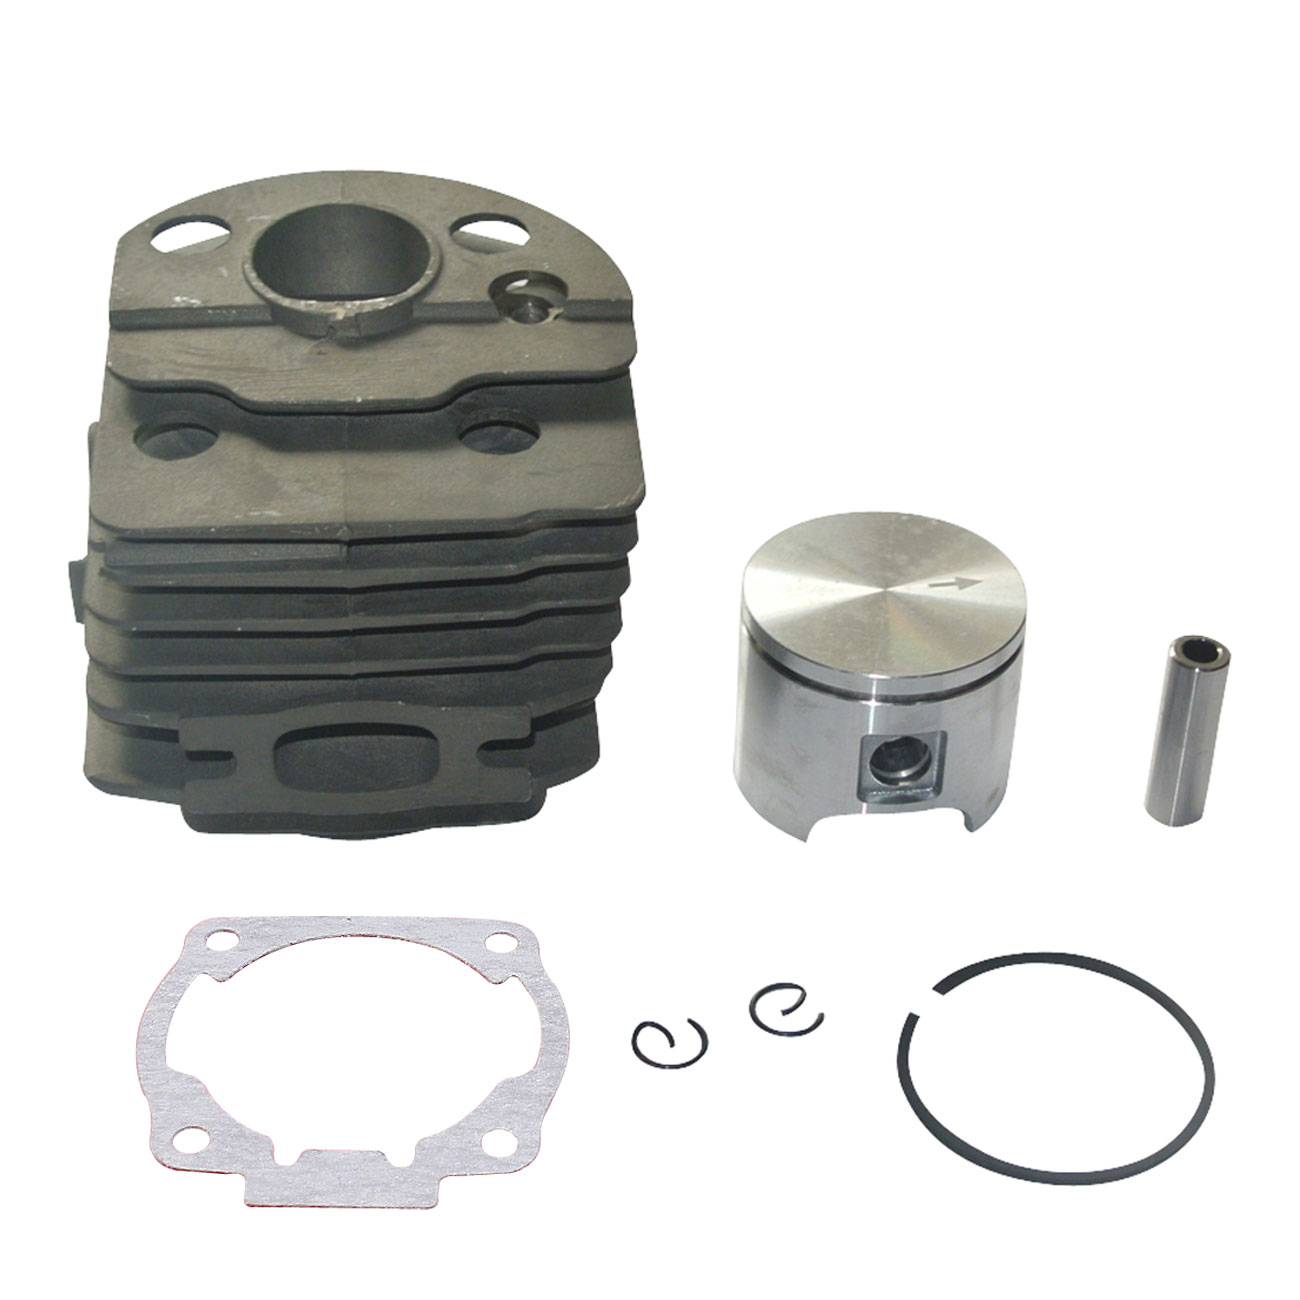 Motore Motore Kit Cilindro Pistone Kit w/Anelli 46 MM Per Husqvarna 51 55 ChiansawMotore Motore Kit Cilindro Pistone Kit w/Anelli 46 MM Per Husqvarna 51 55 Chiansaw